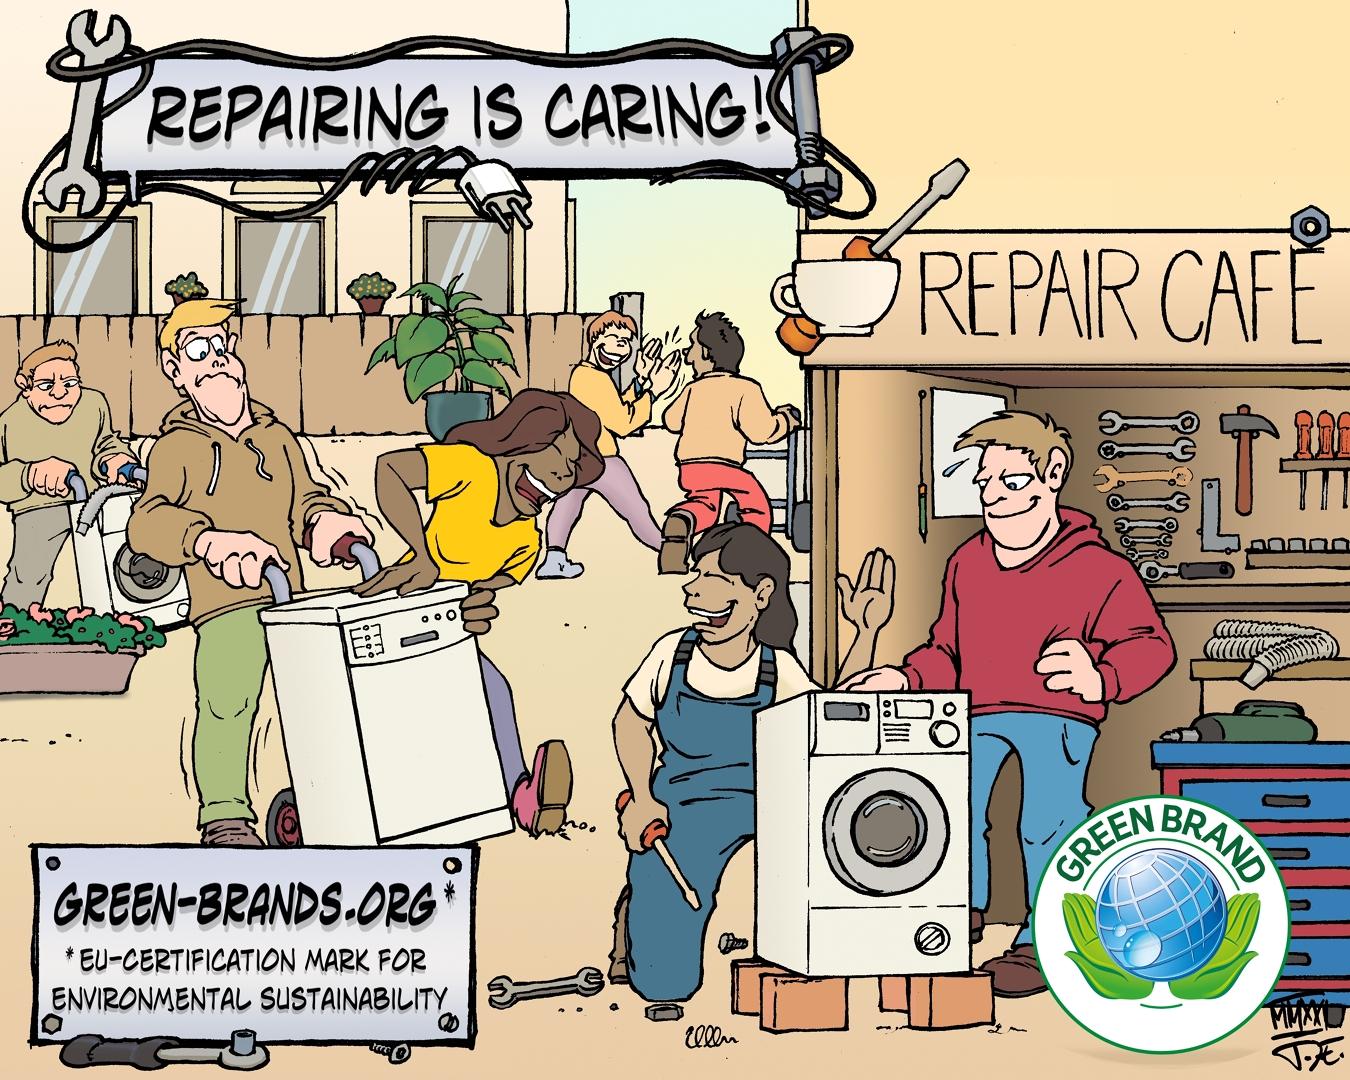 Repairing is caring!